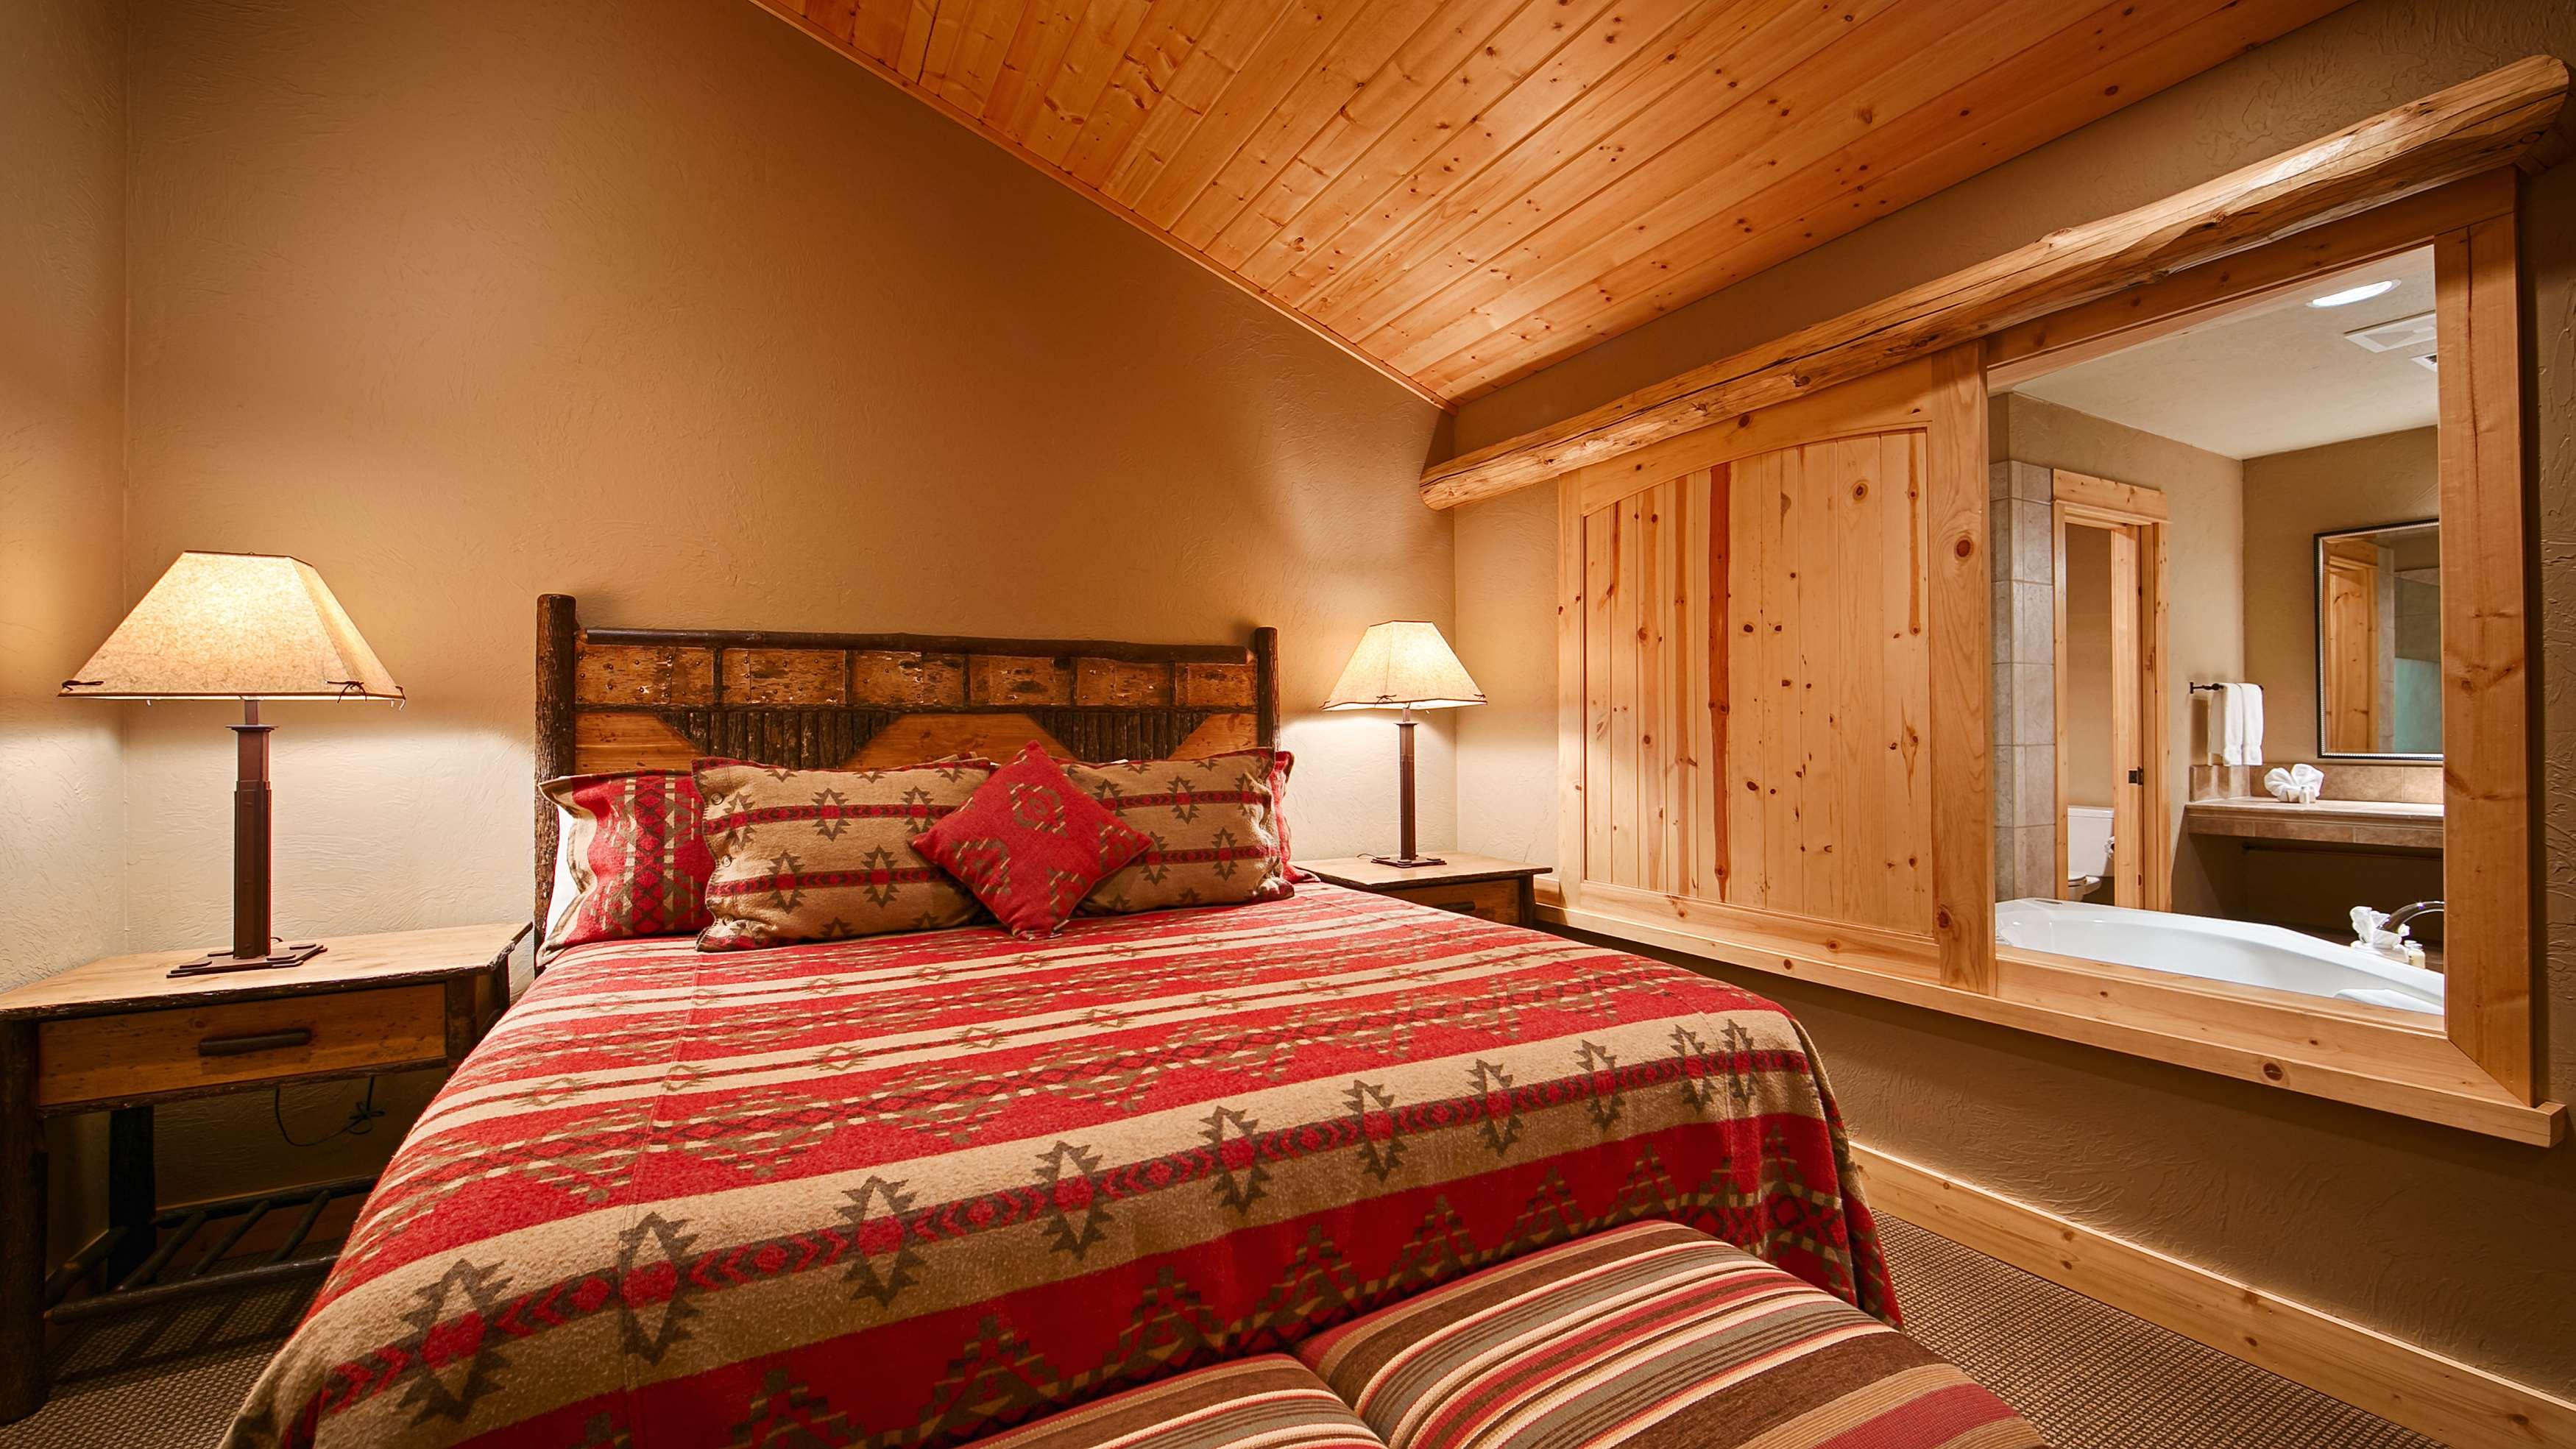 Best Western Ponderosa Lodge image 18